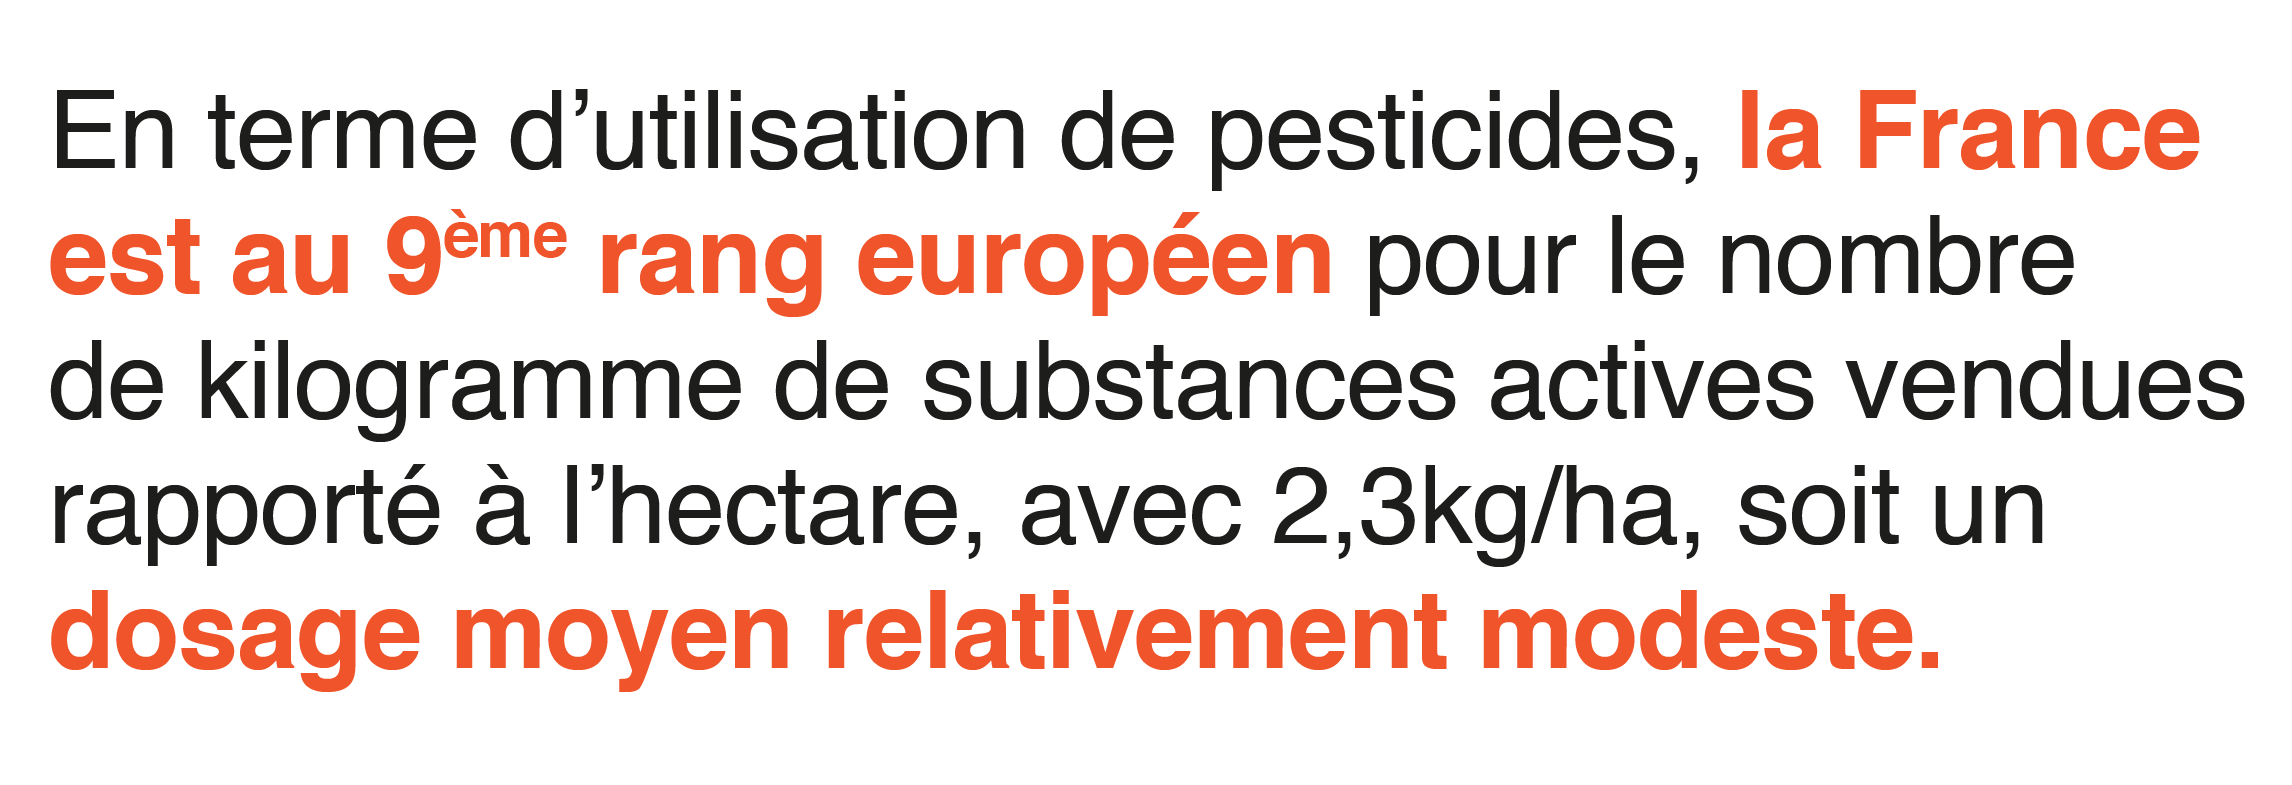 pesticides-dose-04-01